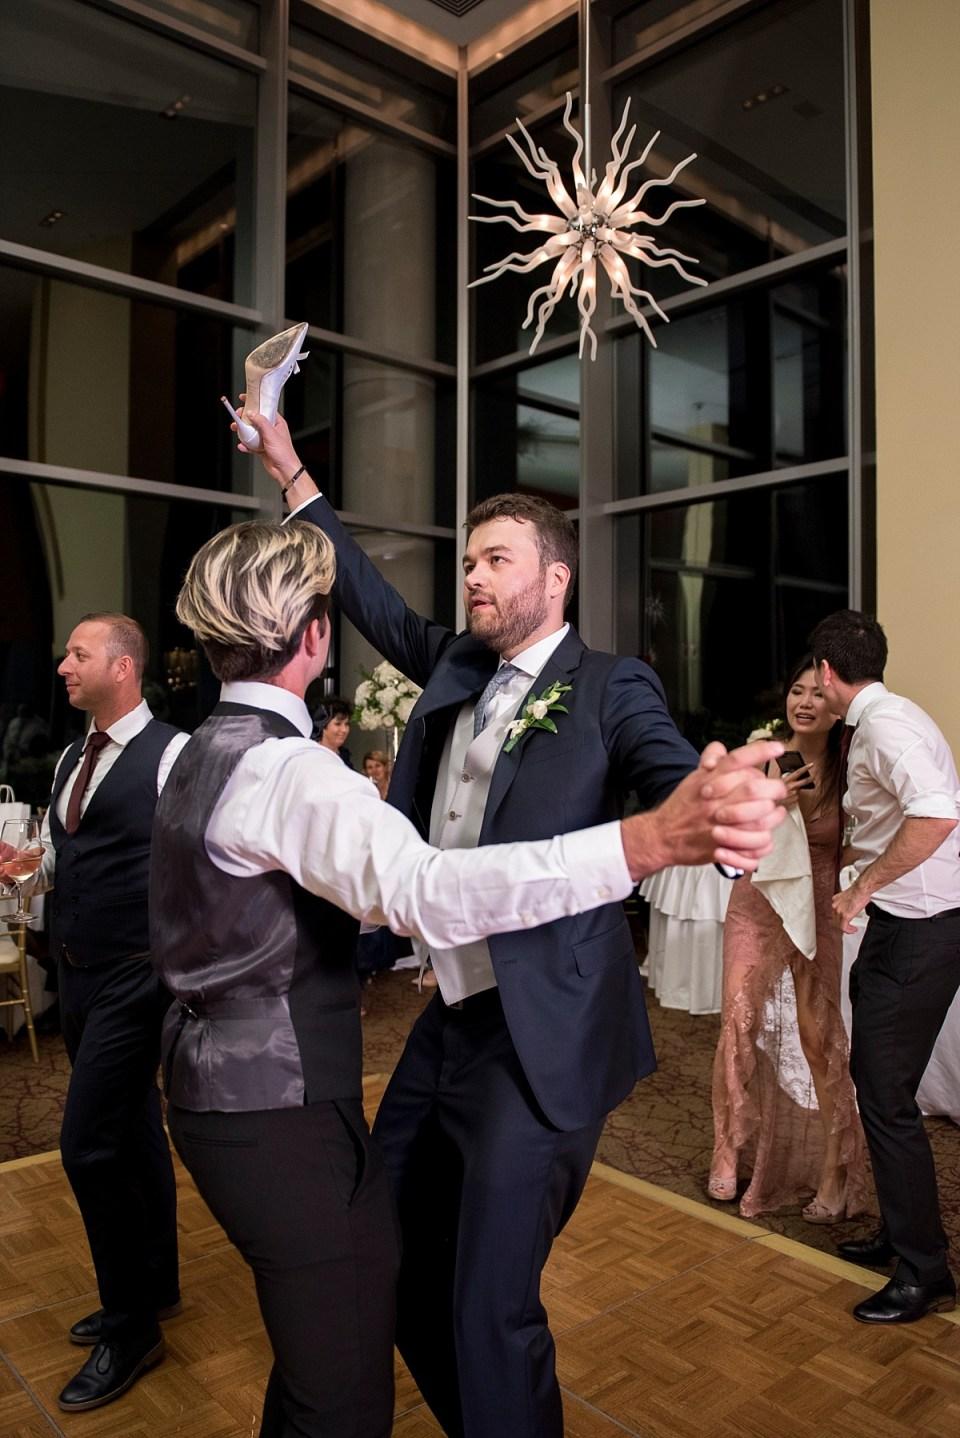 Armenian Wedding Tradition, Shoe Stealing